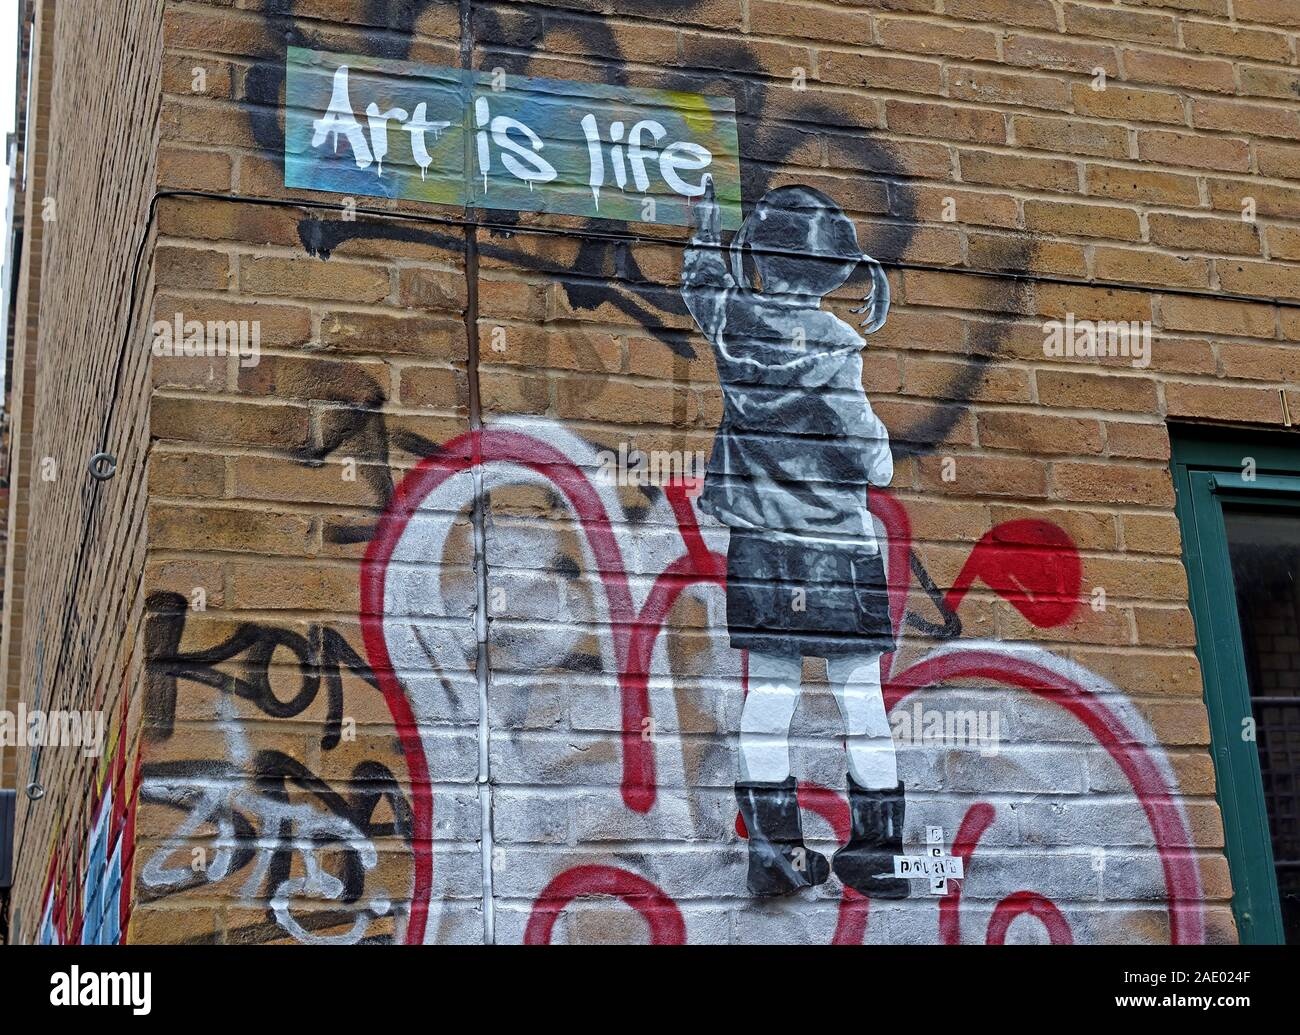 @Hotpixuk,HotpixUK,GoTonySmith,UK,England,painting,graffiti,spraying,art,girl,girl painting,pigtail,pigtails